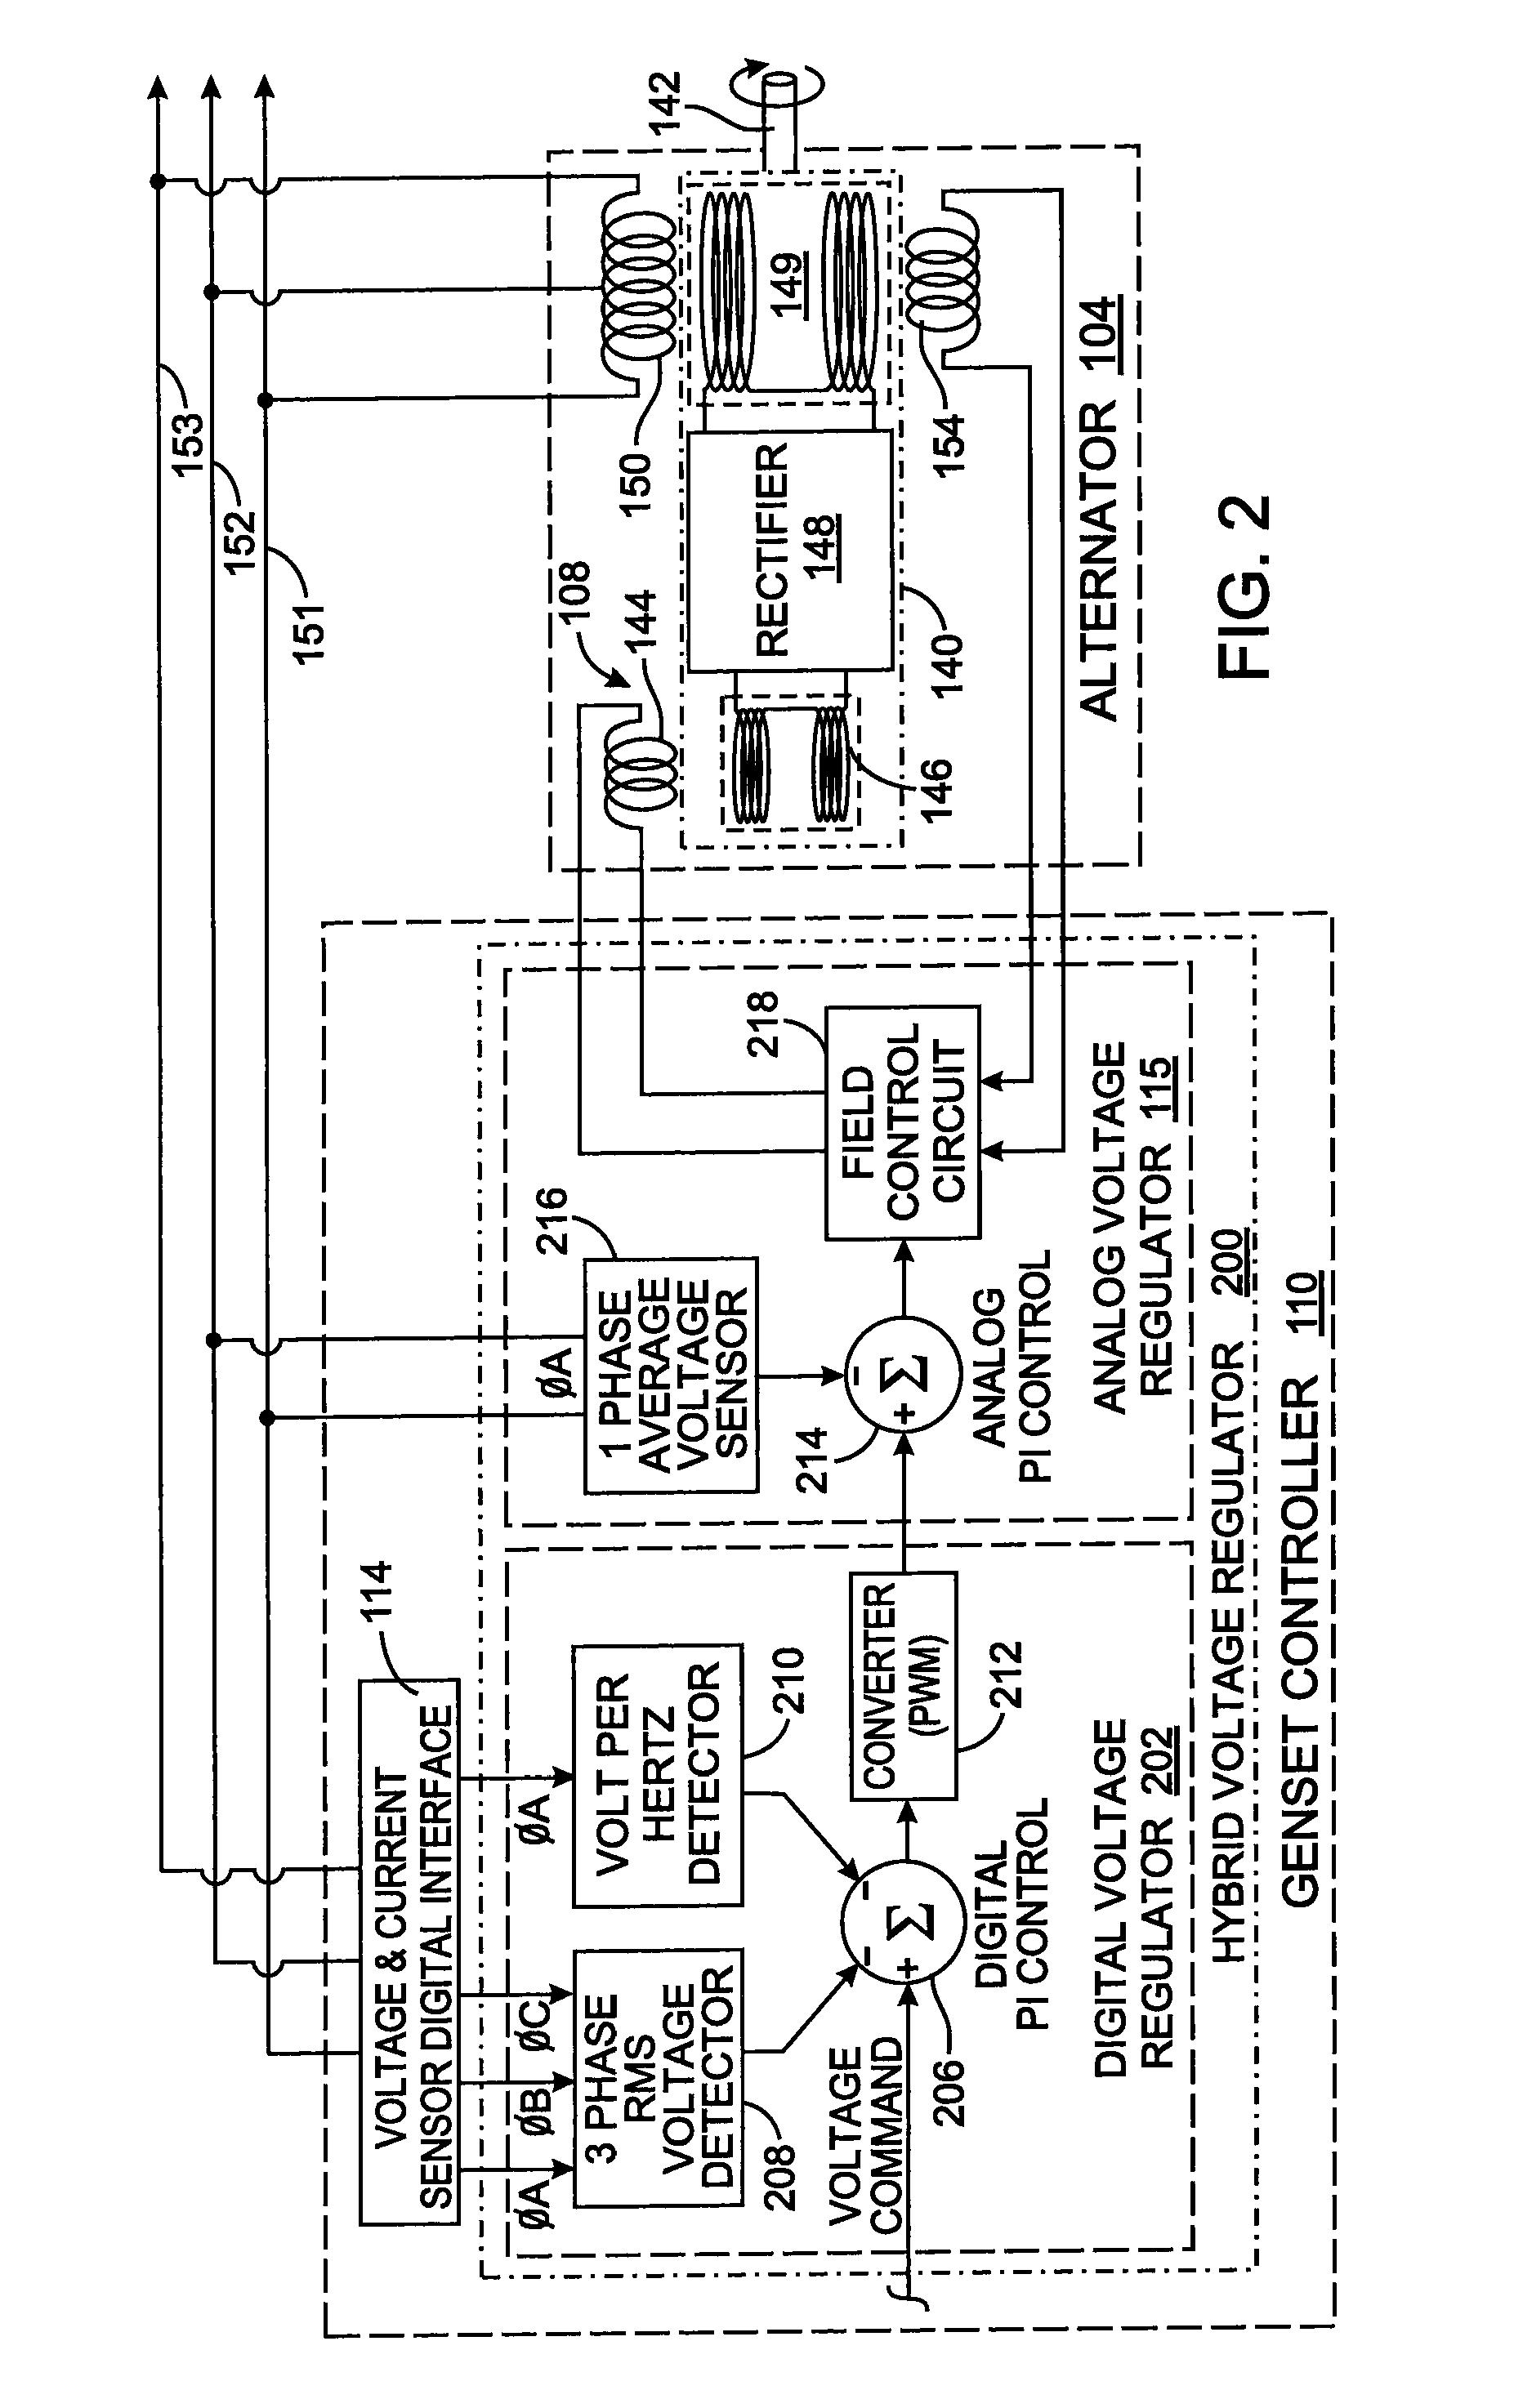 Patent Us20090218991 Method And Apparatus For Regulating Integral Voltage Regulator Wiring Diagram Drawing